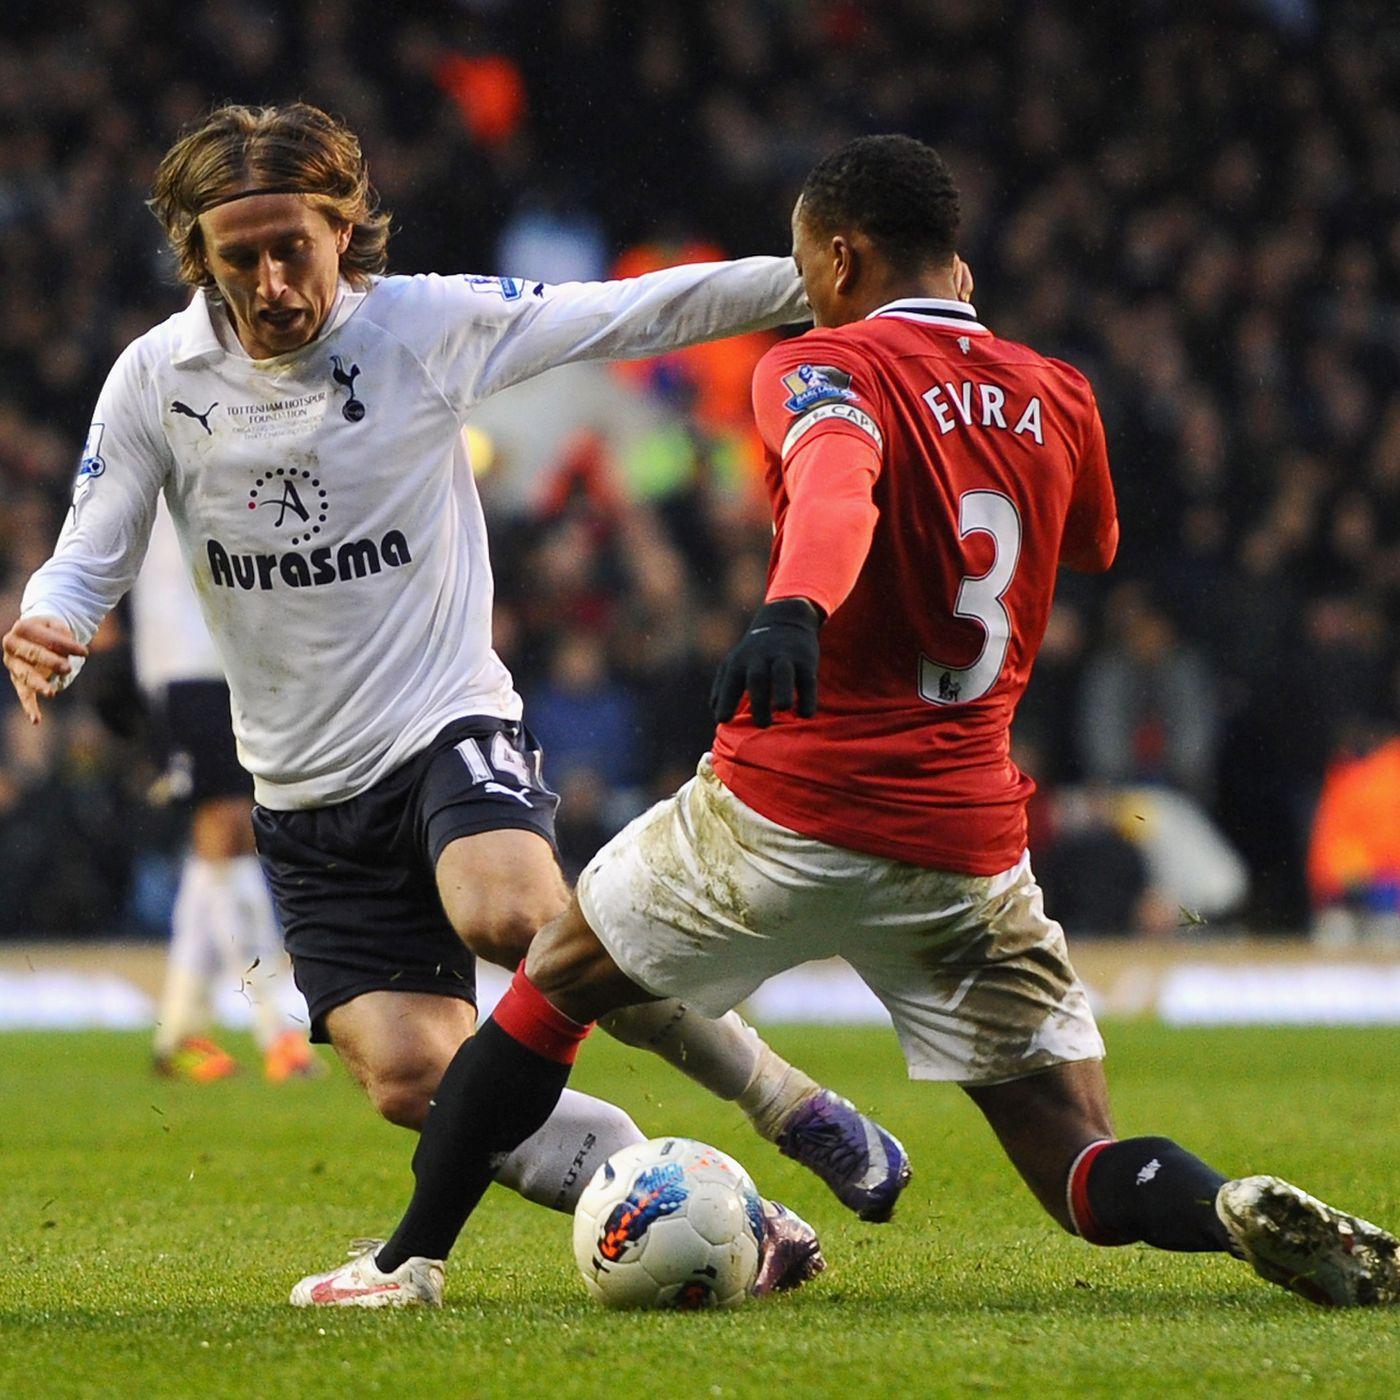 1ceacf728 Luka Modric has regrets about how he left Tottenham Hotspur ...